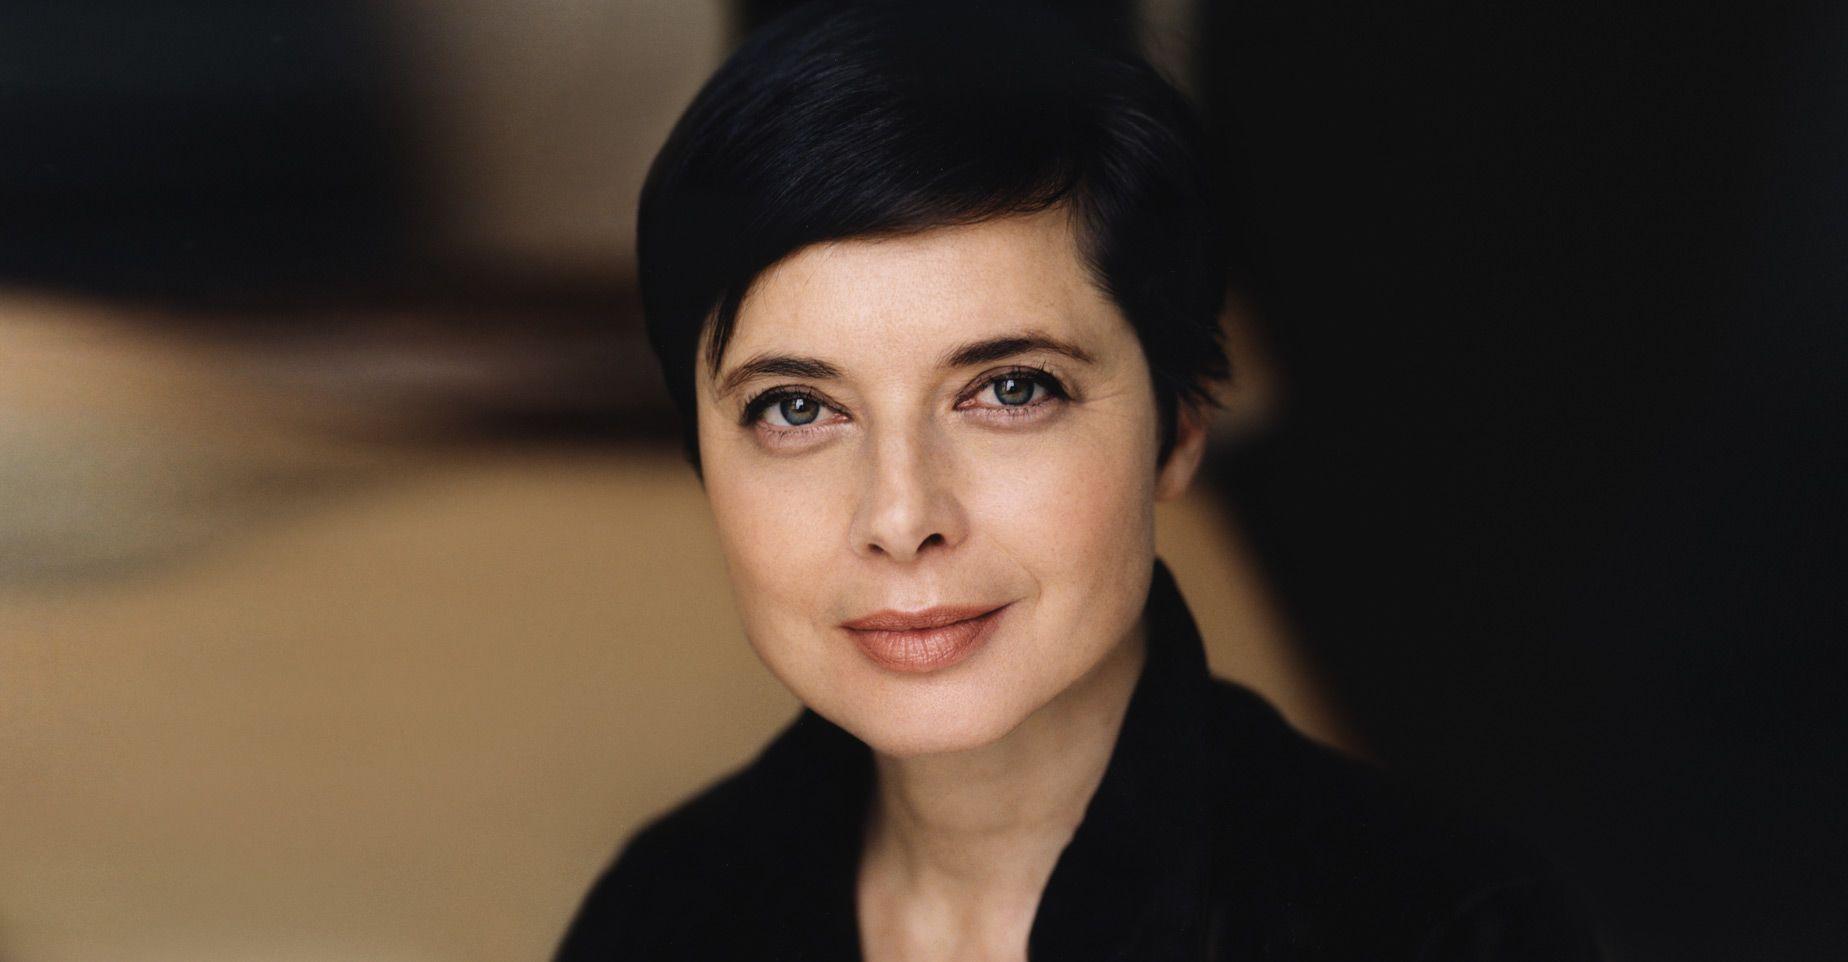 4. Isabella Rosselline